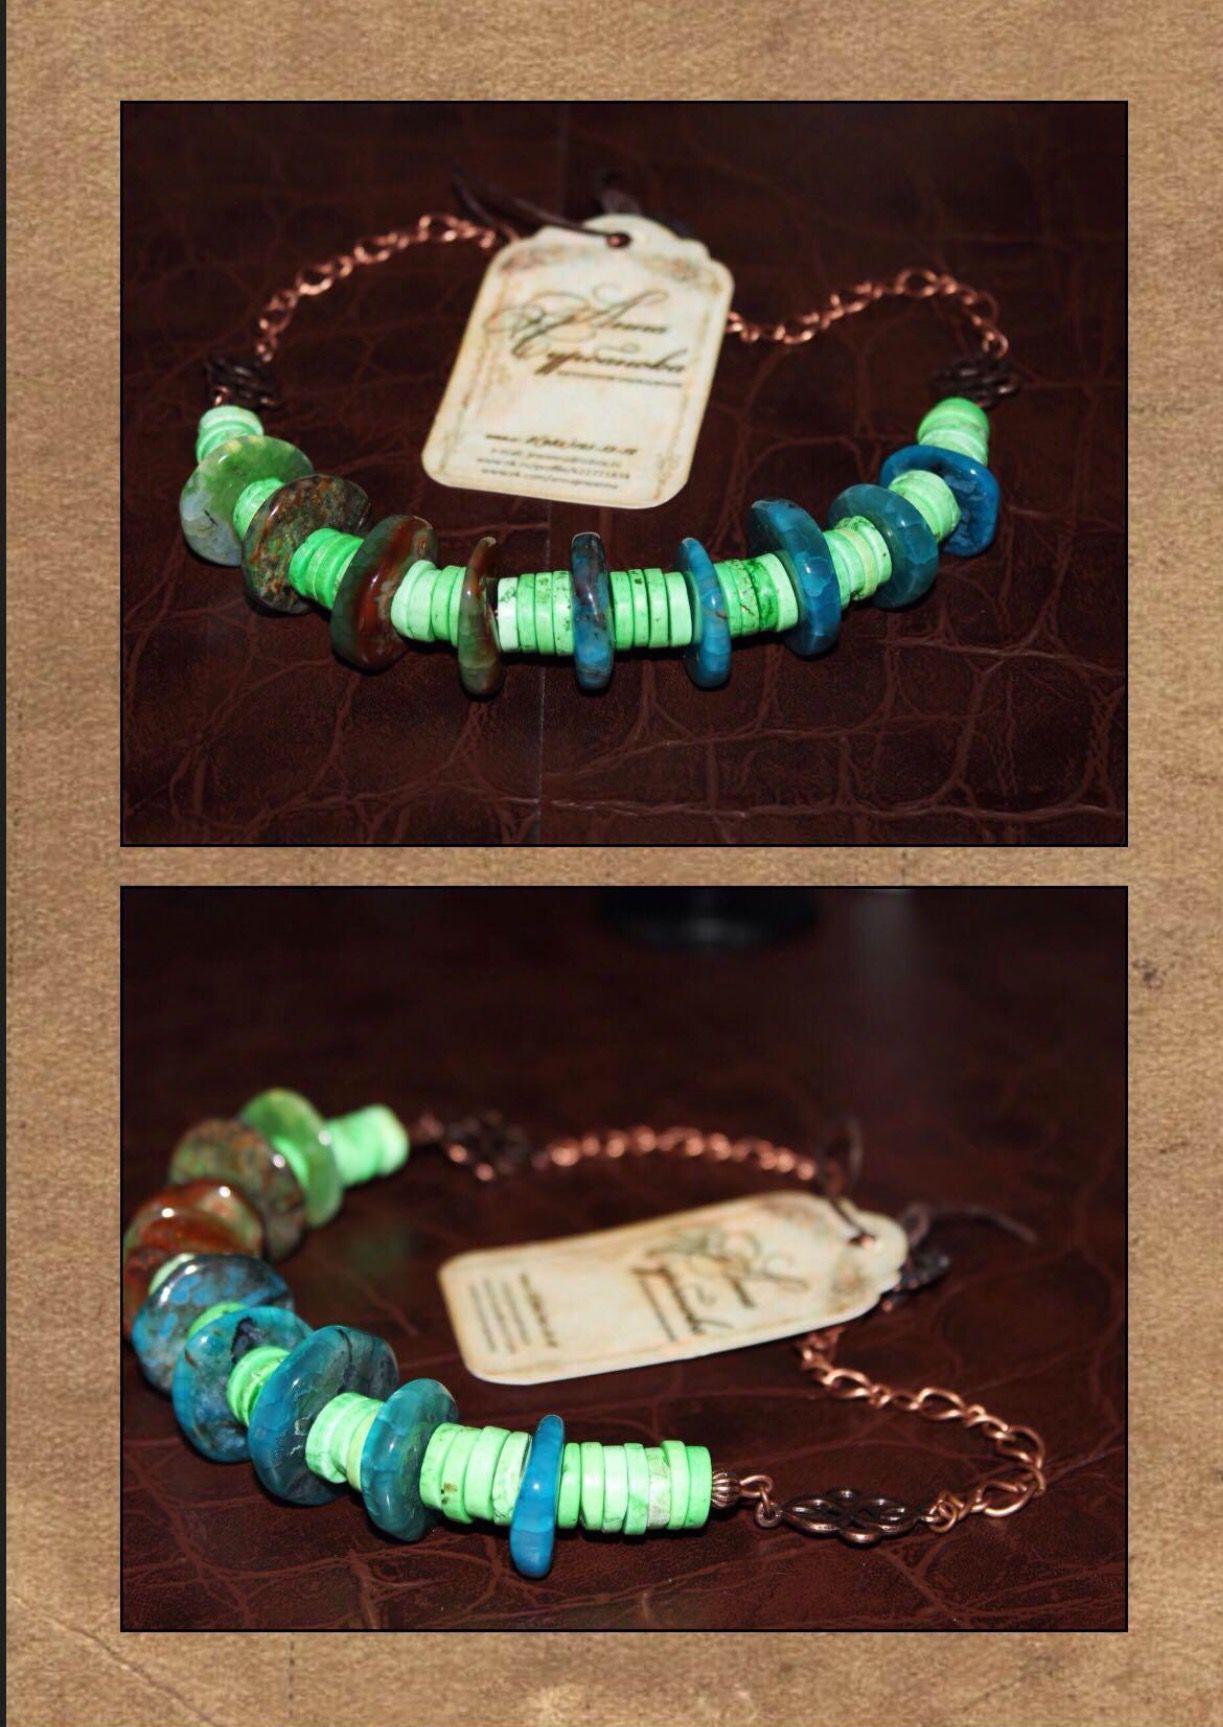 зеленое украшения подарки handmade агат ручнаяработа натуральныекамни